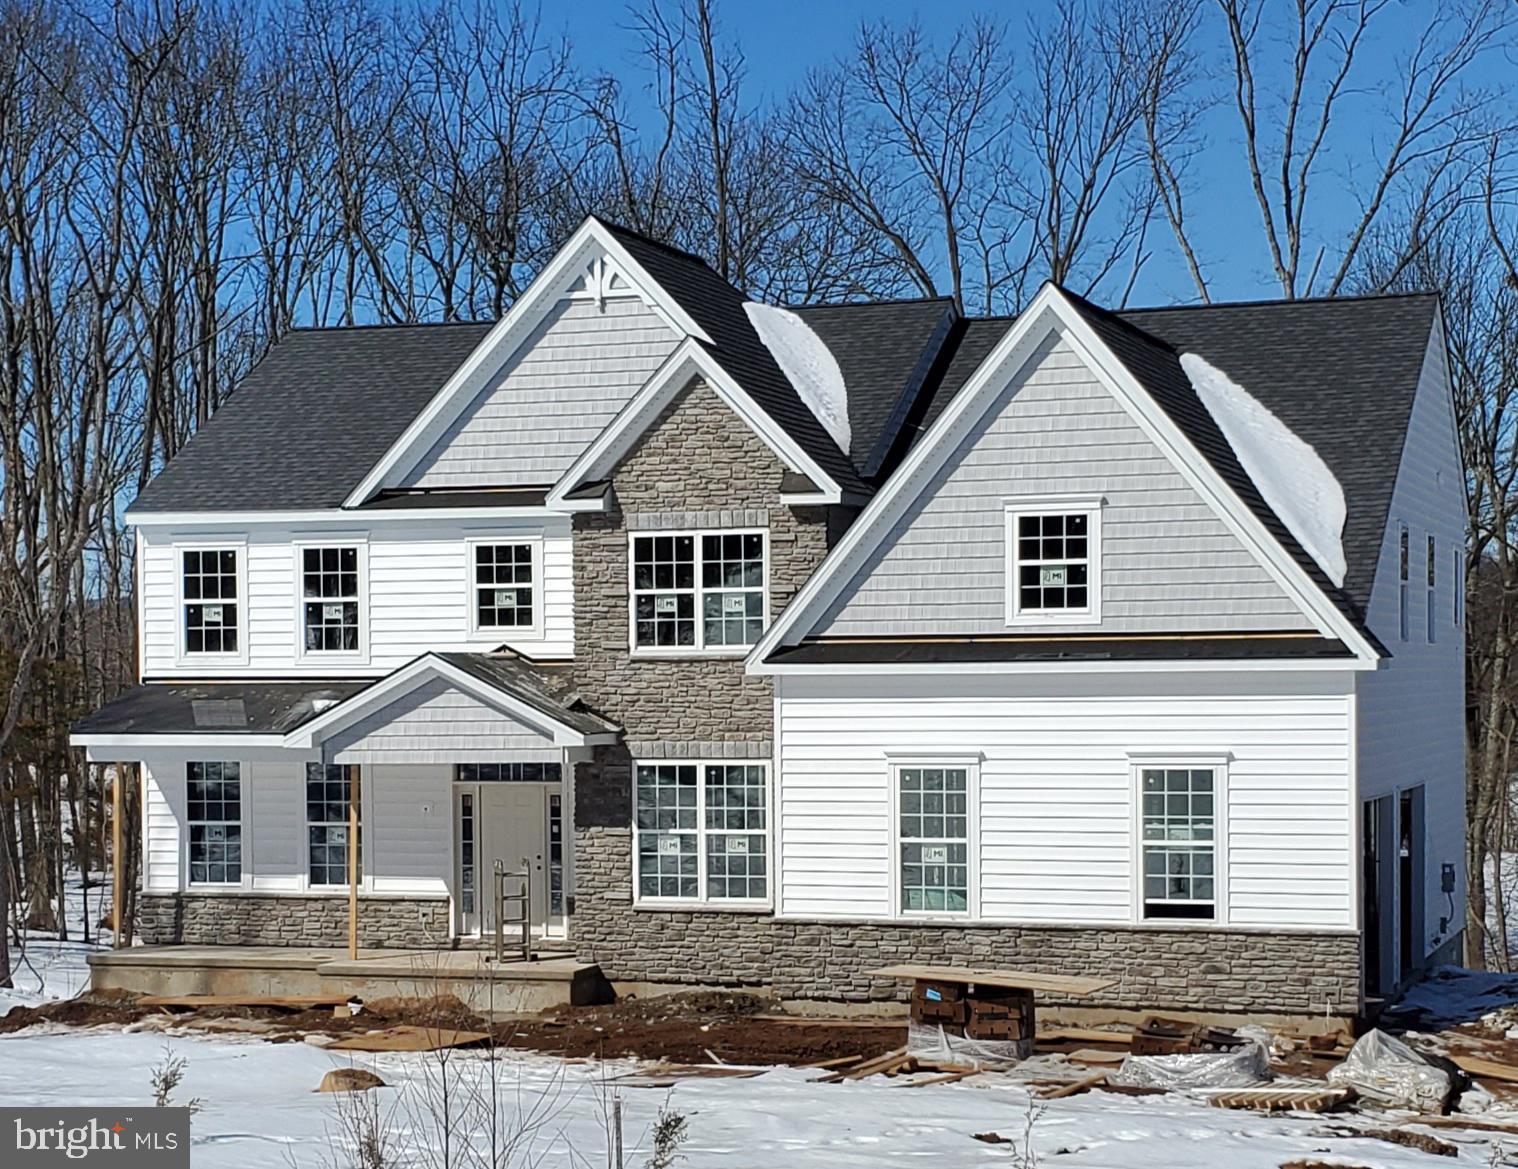 805 NORTH LIMERICK ROAD N, SCHWENKSVILLE, Pennsylvania 19473, 4 Bedrooms Bedrooms, ,3 BathroomsBathrooms,Single Family,For Sale,805 NORTH LIMERICK ROAD N,PAMC667082